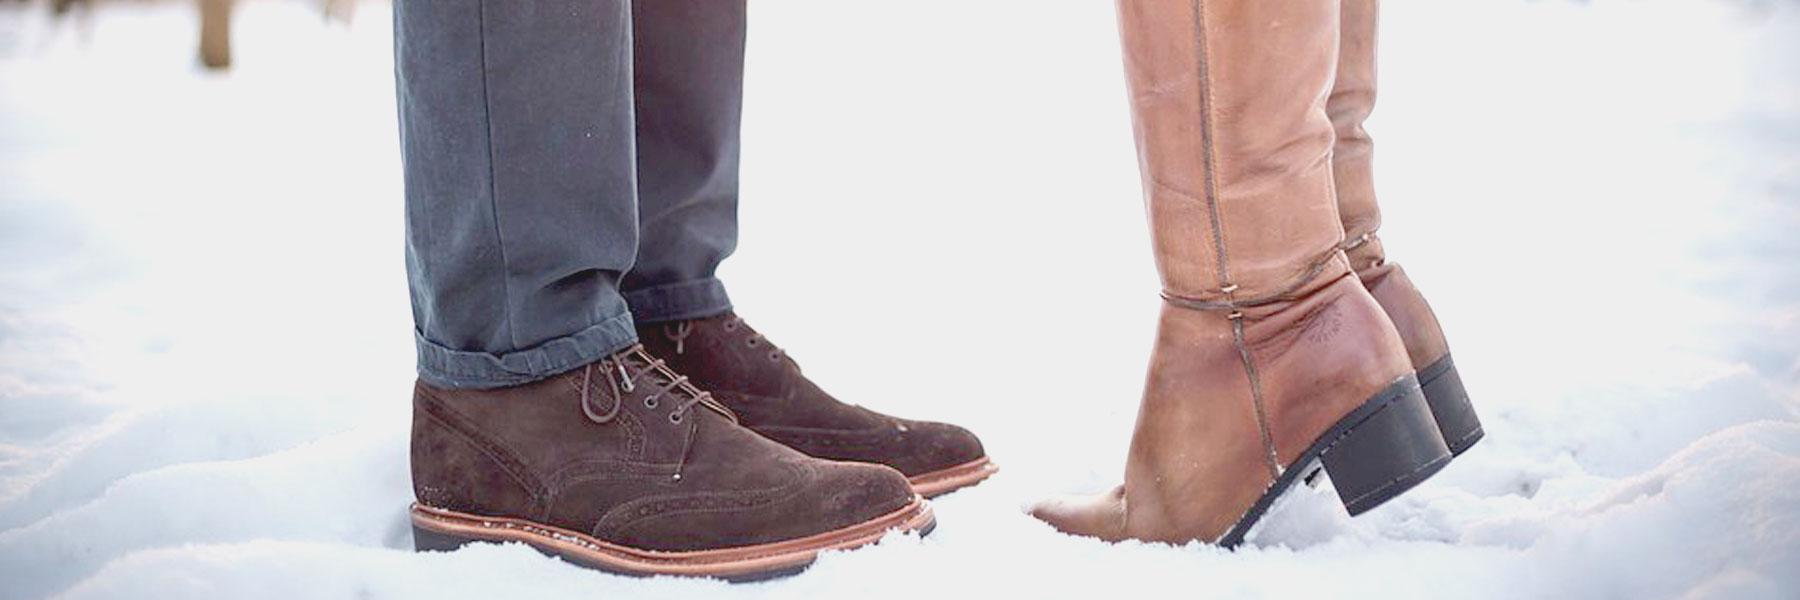 d741c25d4dd76 Beste Marke für warme Stiefel - Online Shop & Outlet 46 - 2